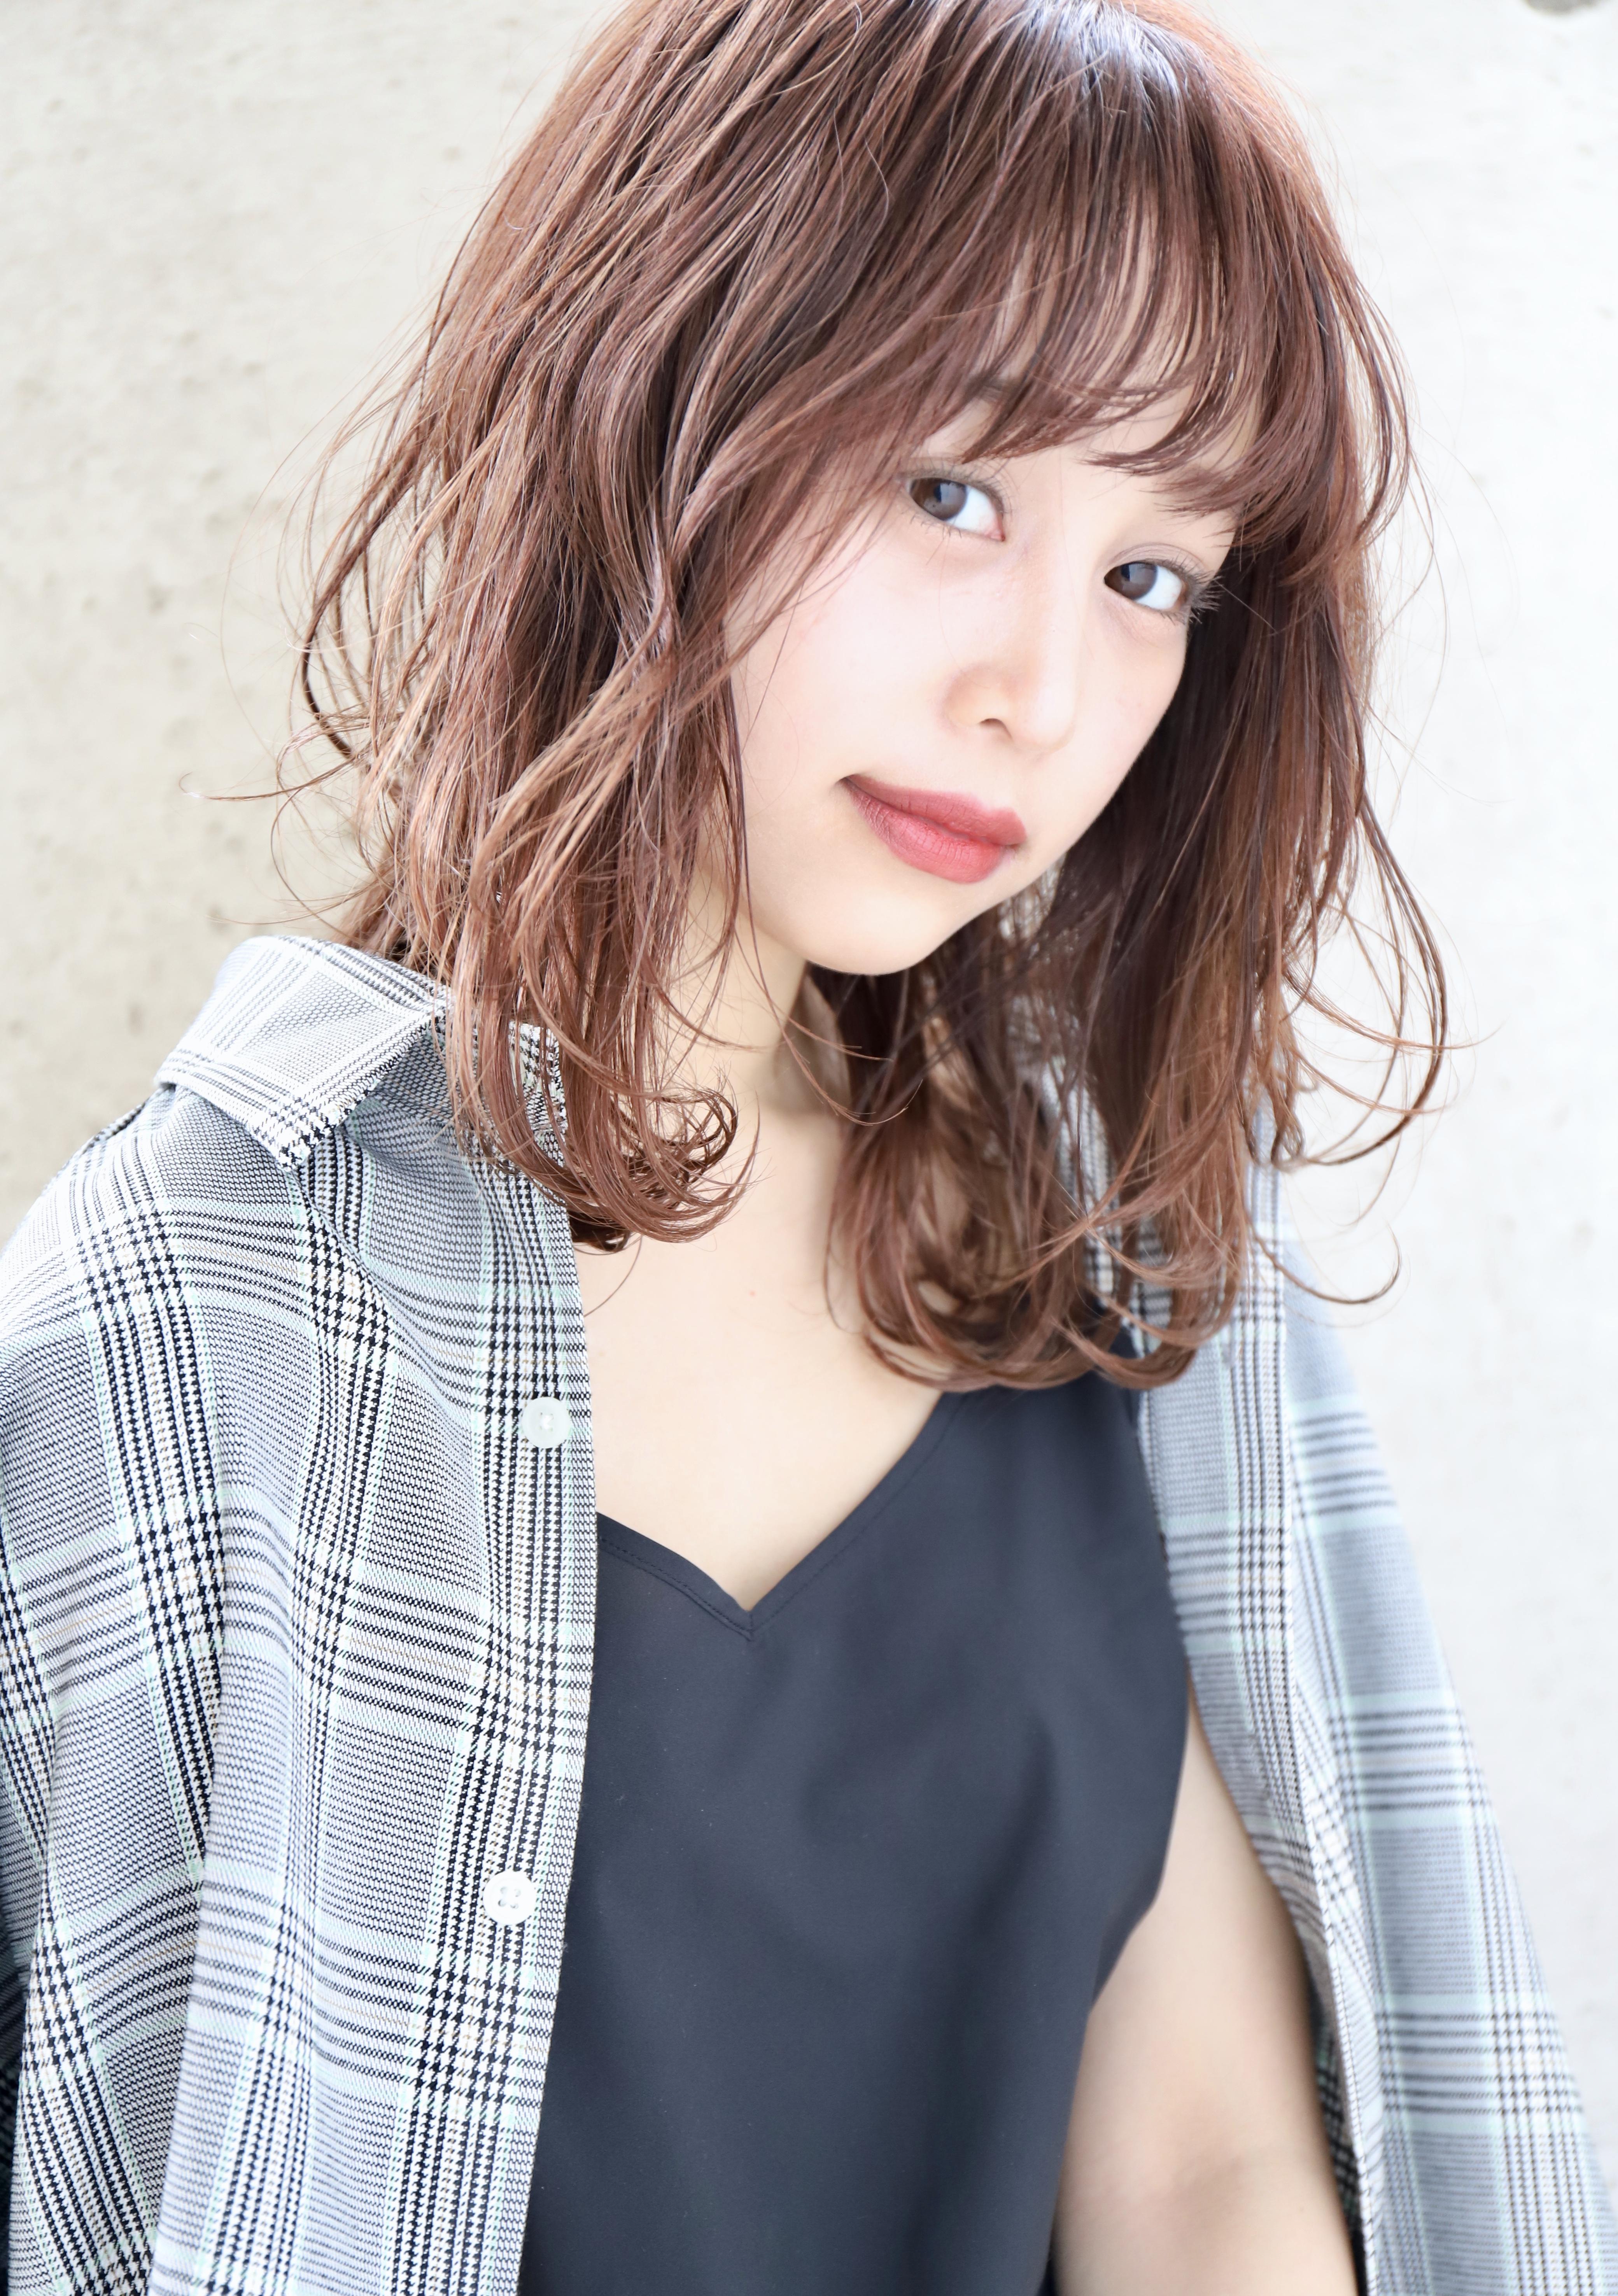 【SeeK NEXT島貫】ハイピンク×くびれミディ